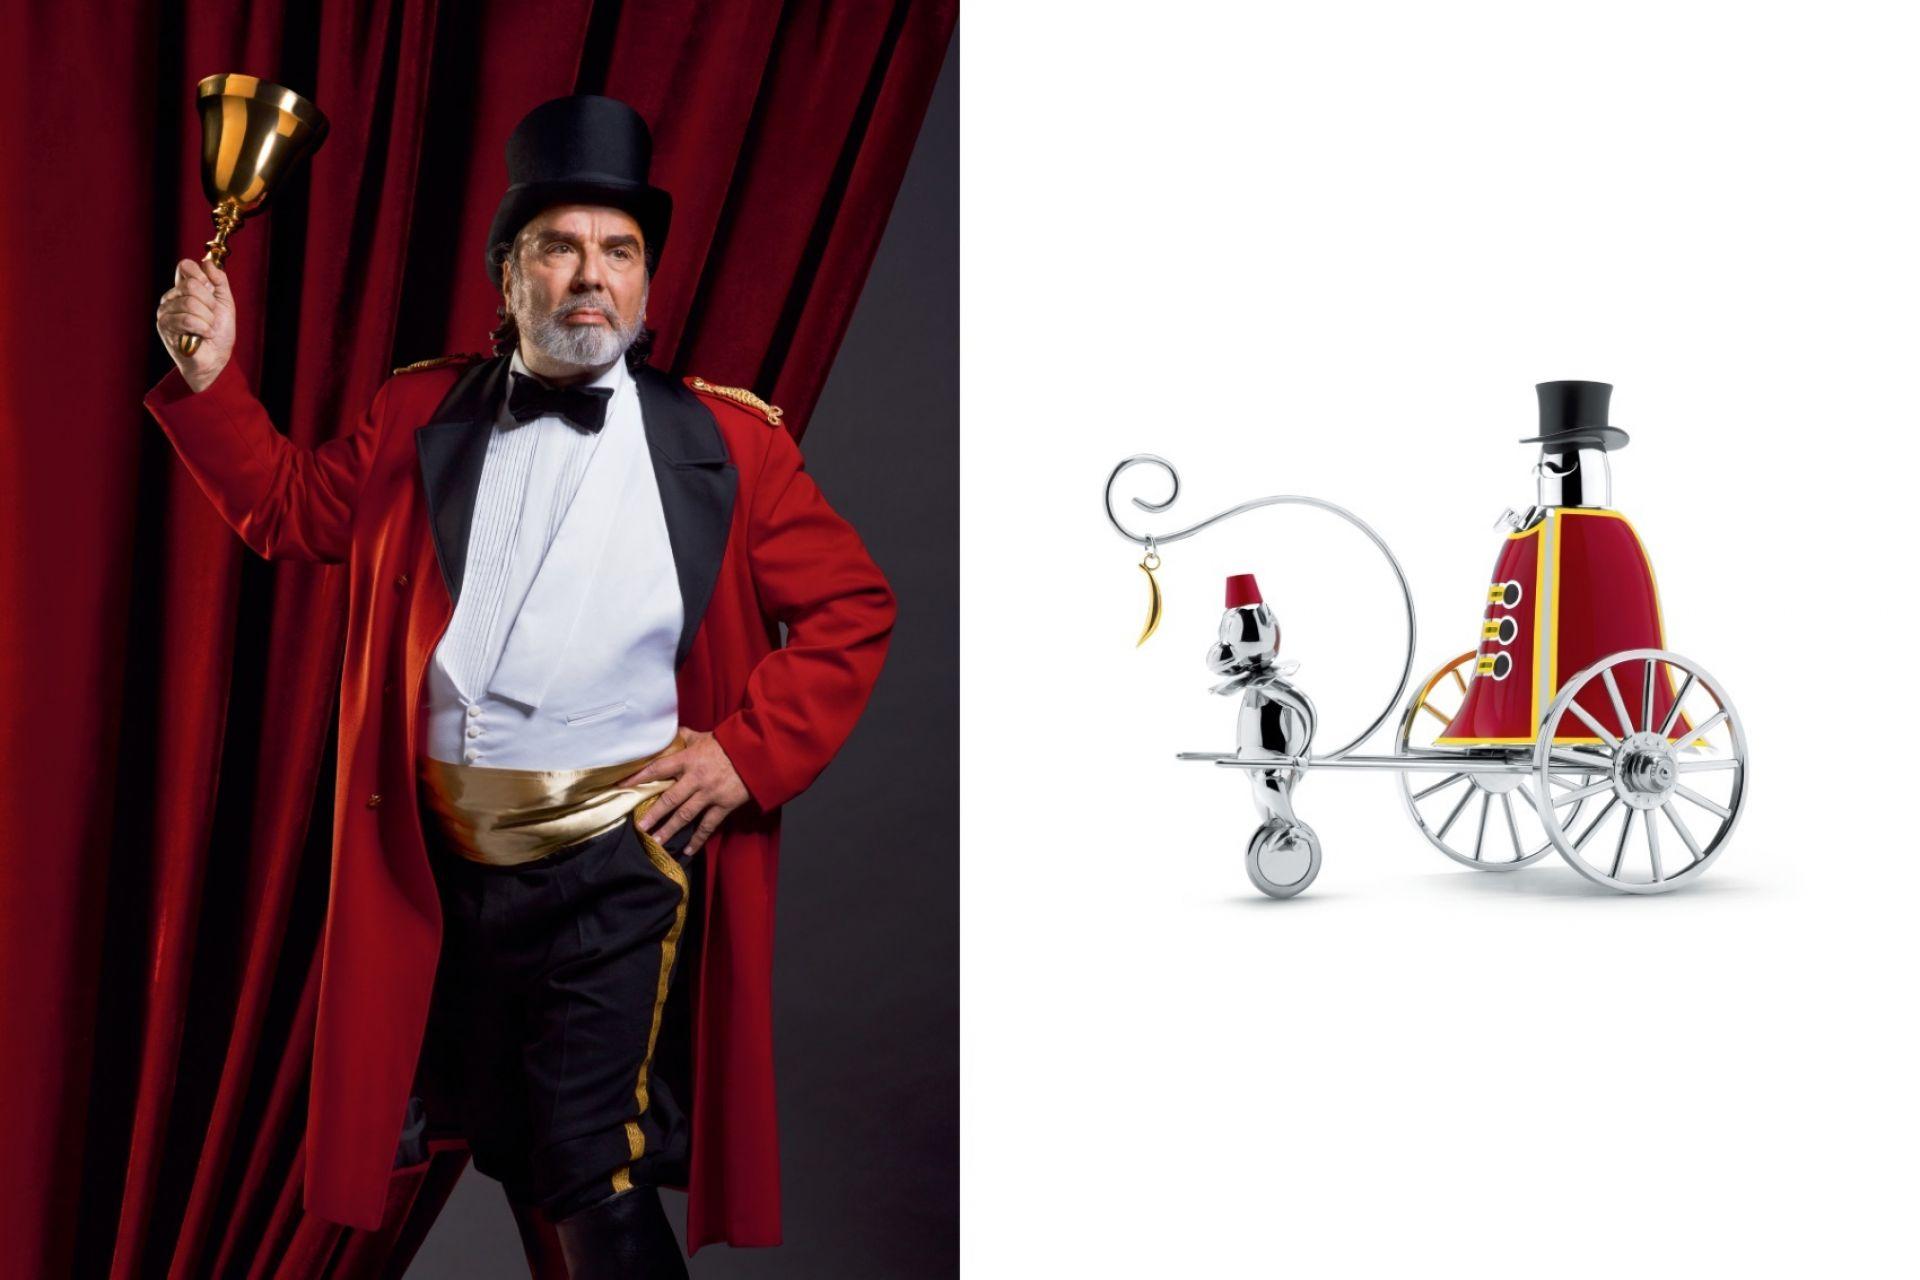 Alessi Circus The Ringleader Tischglocke Alessi LIMITIERTE EDITION